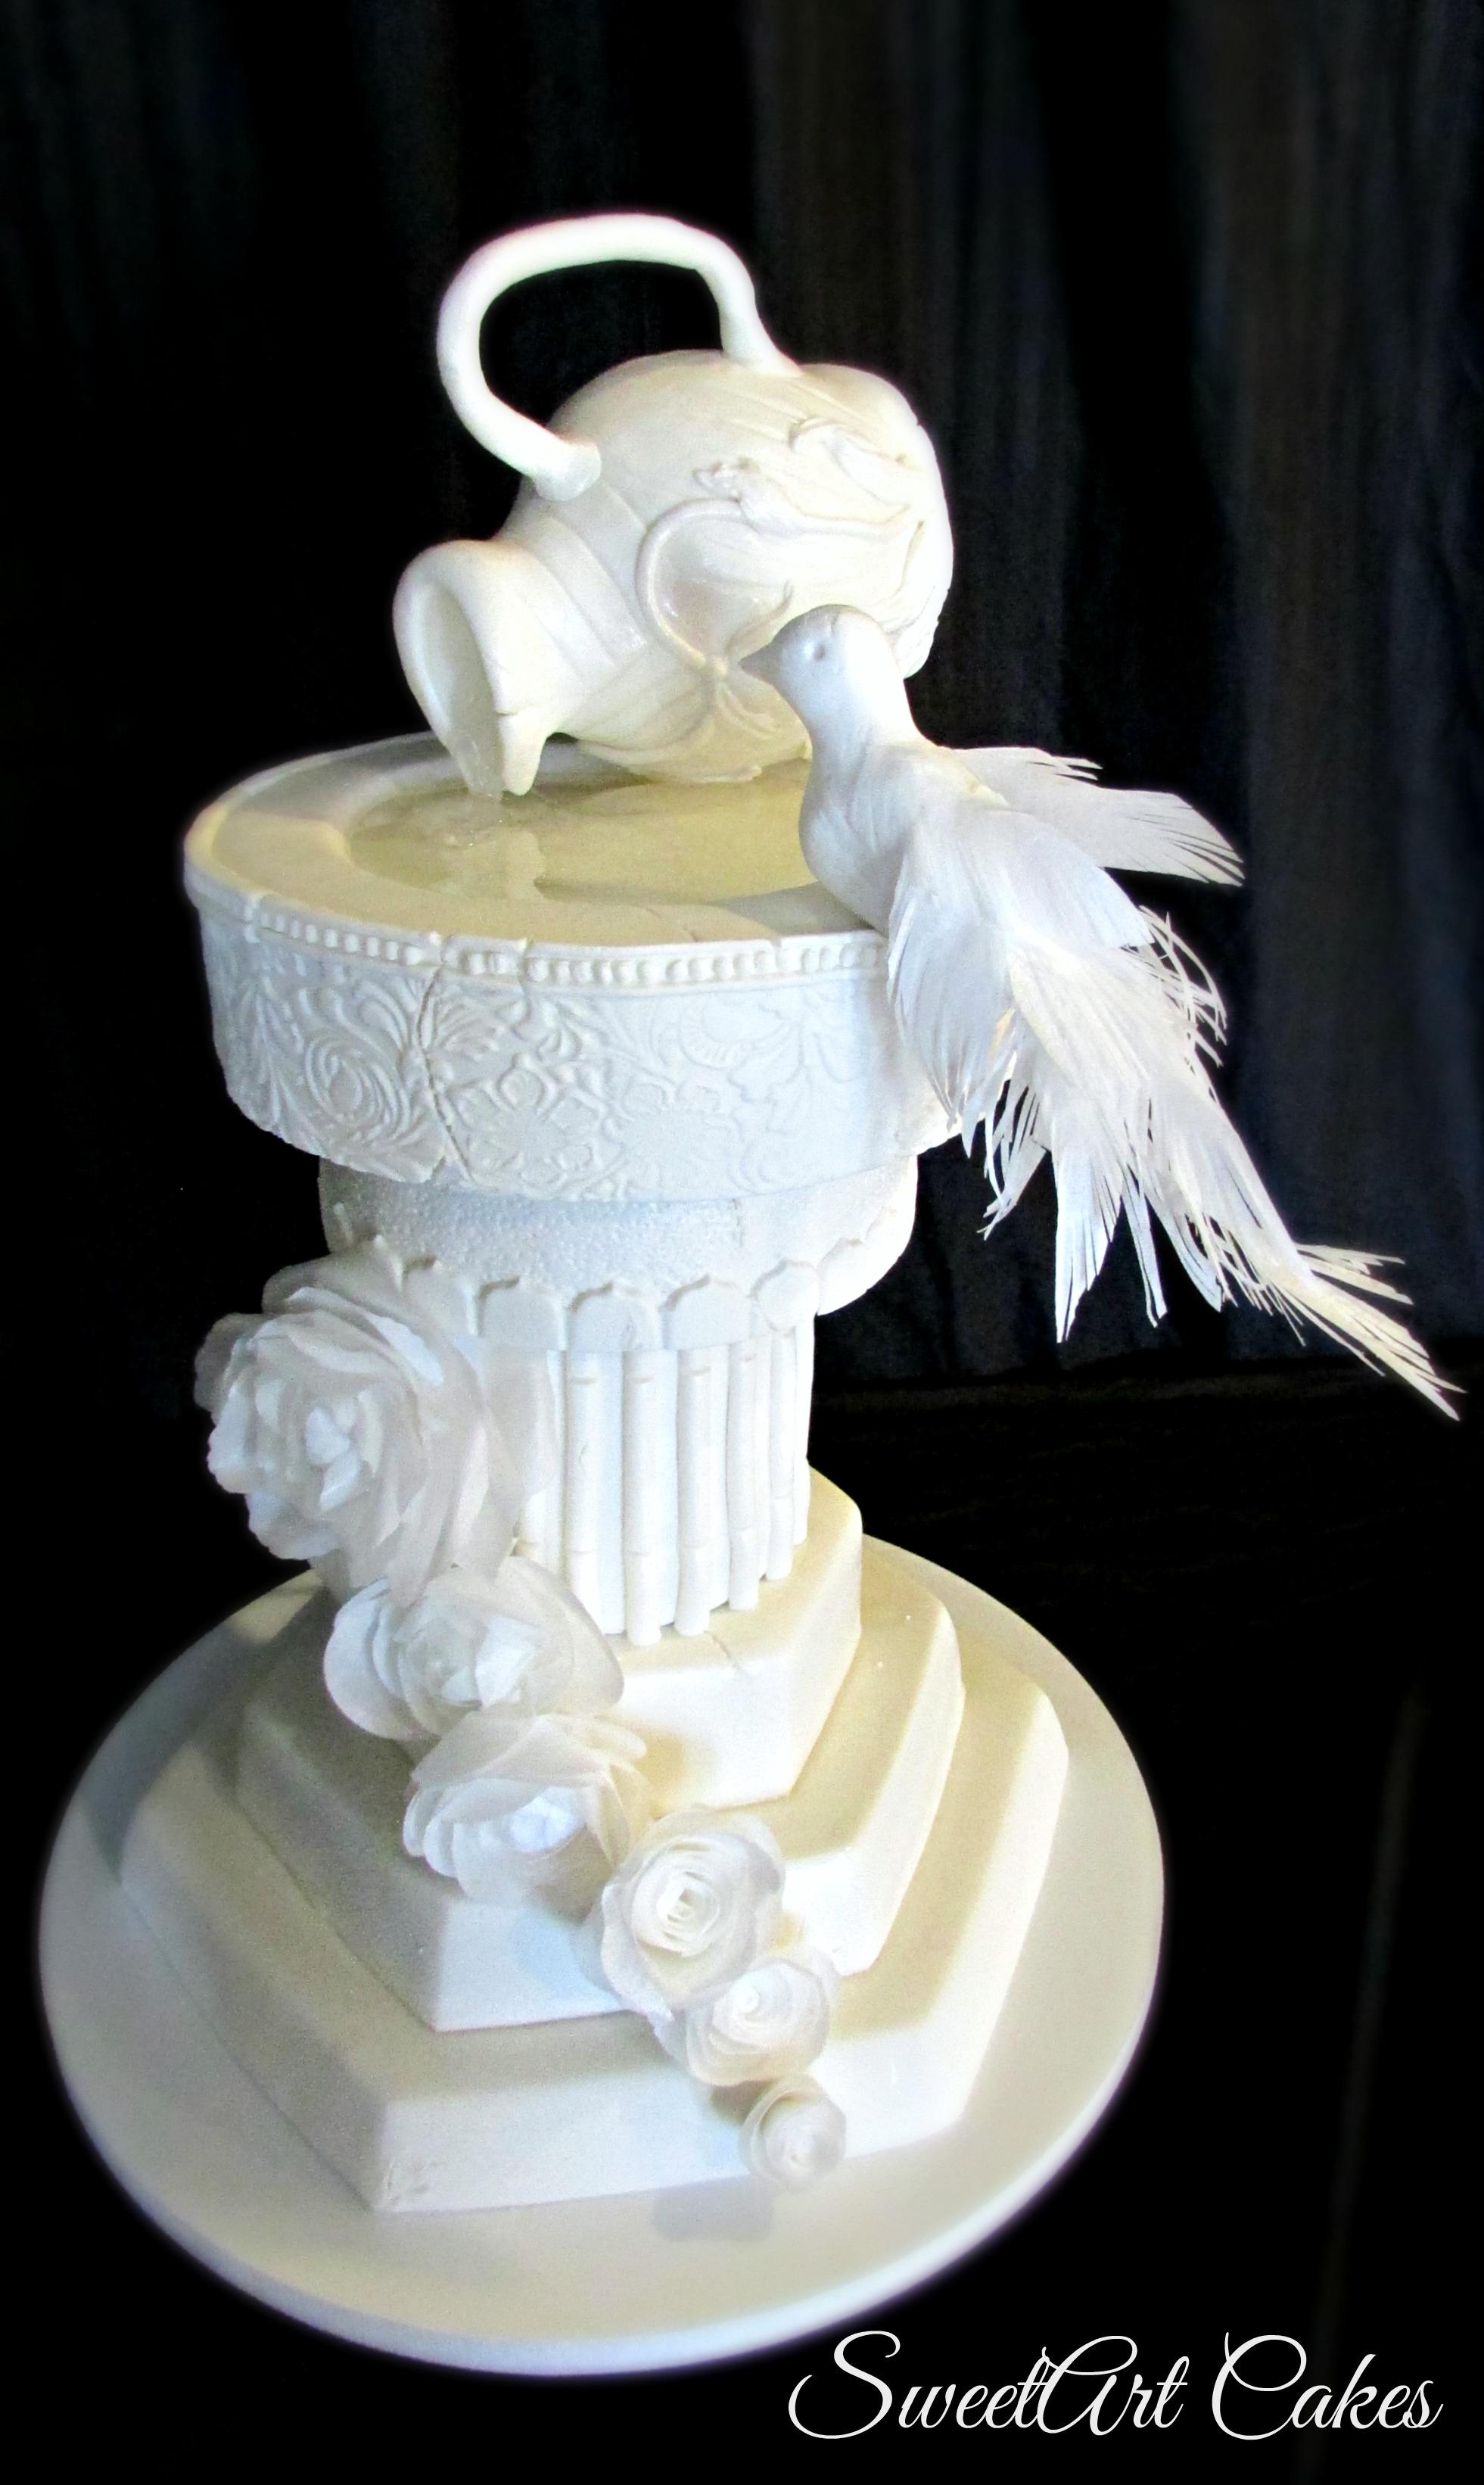 Aged Greek Birdbath Cake